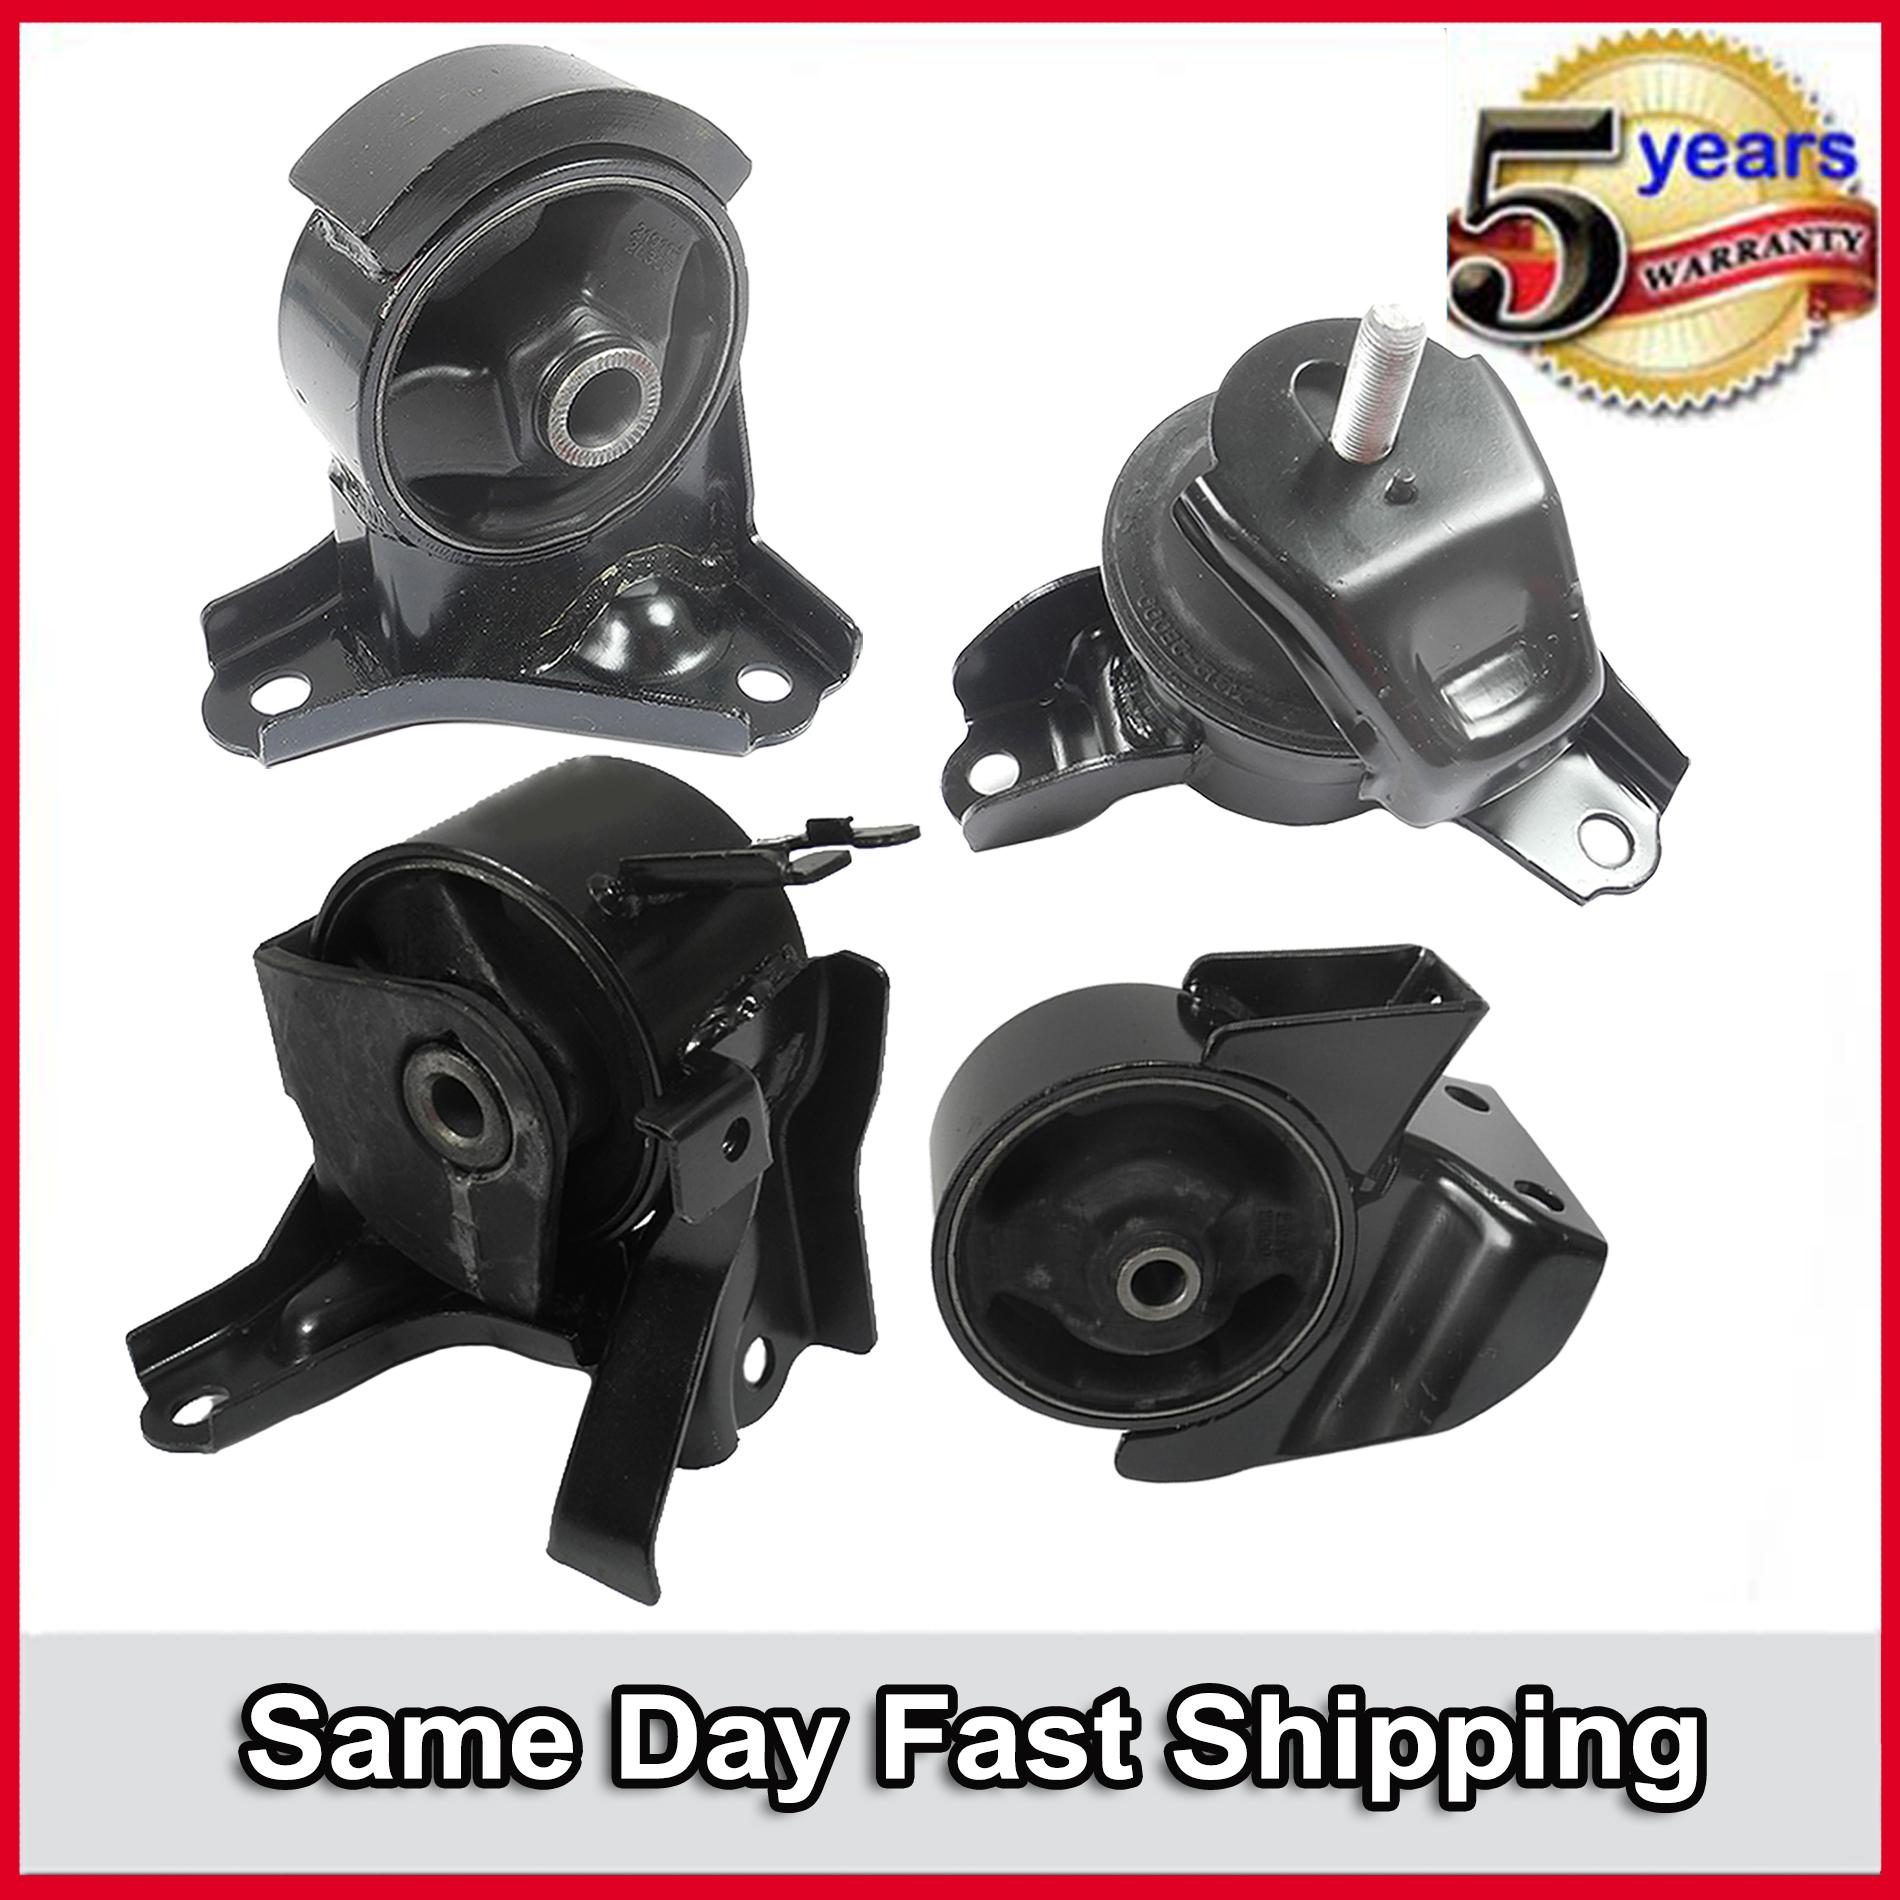 05-09 For Hyundai Tucson 2.0L Manual Engine Motor /& Trans Mount 7138 7143 7131